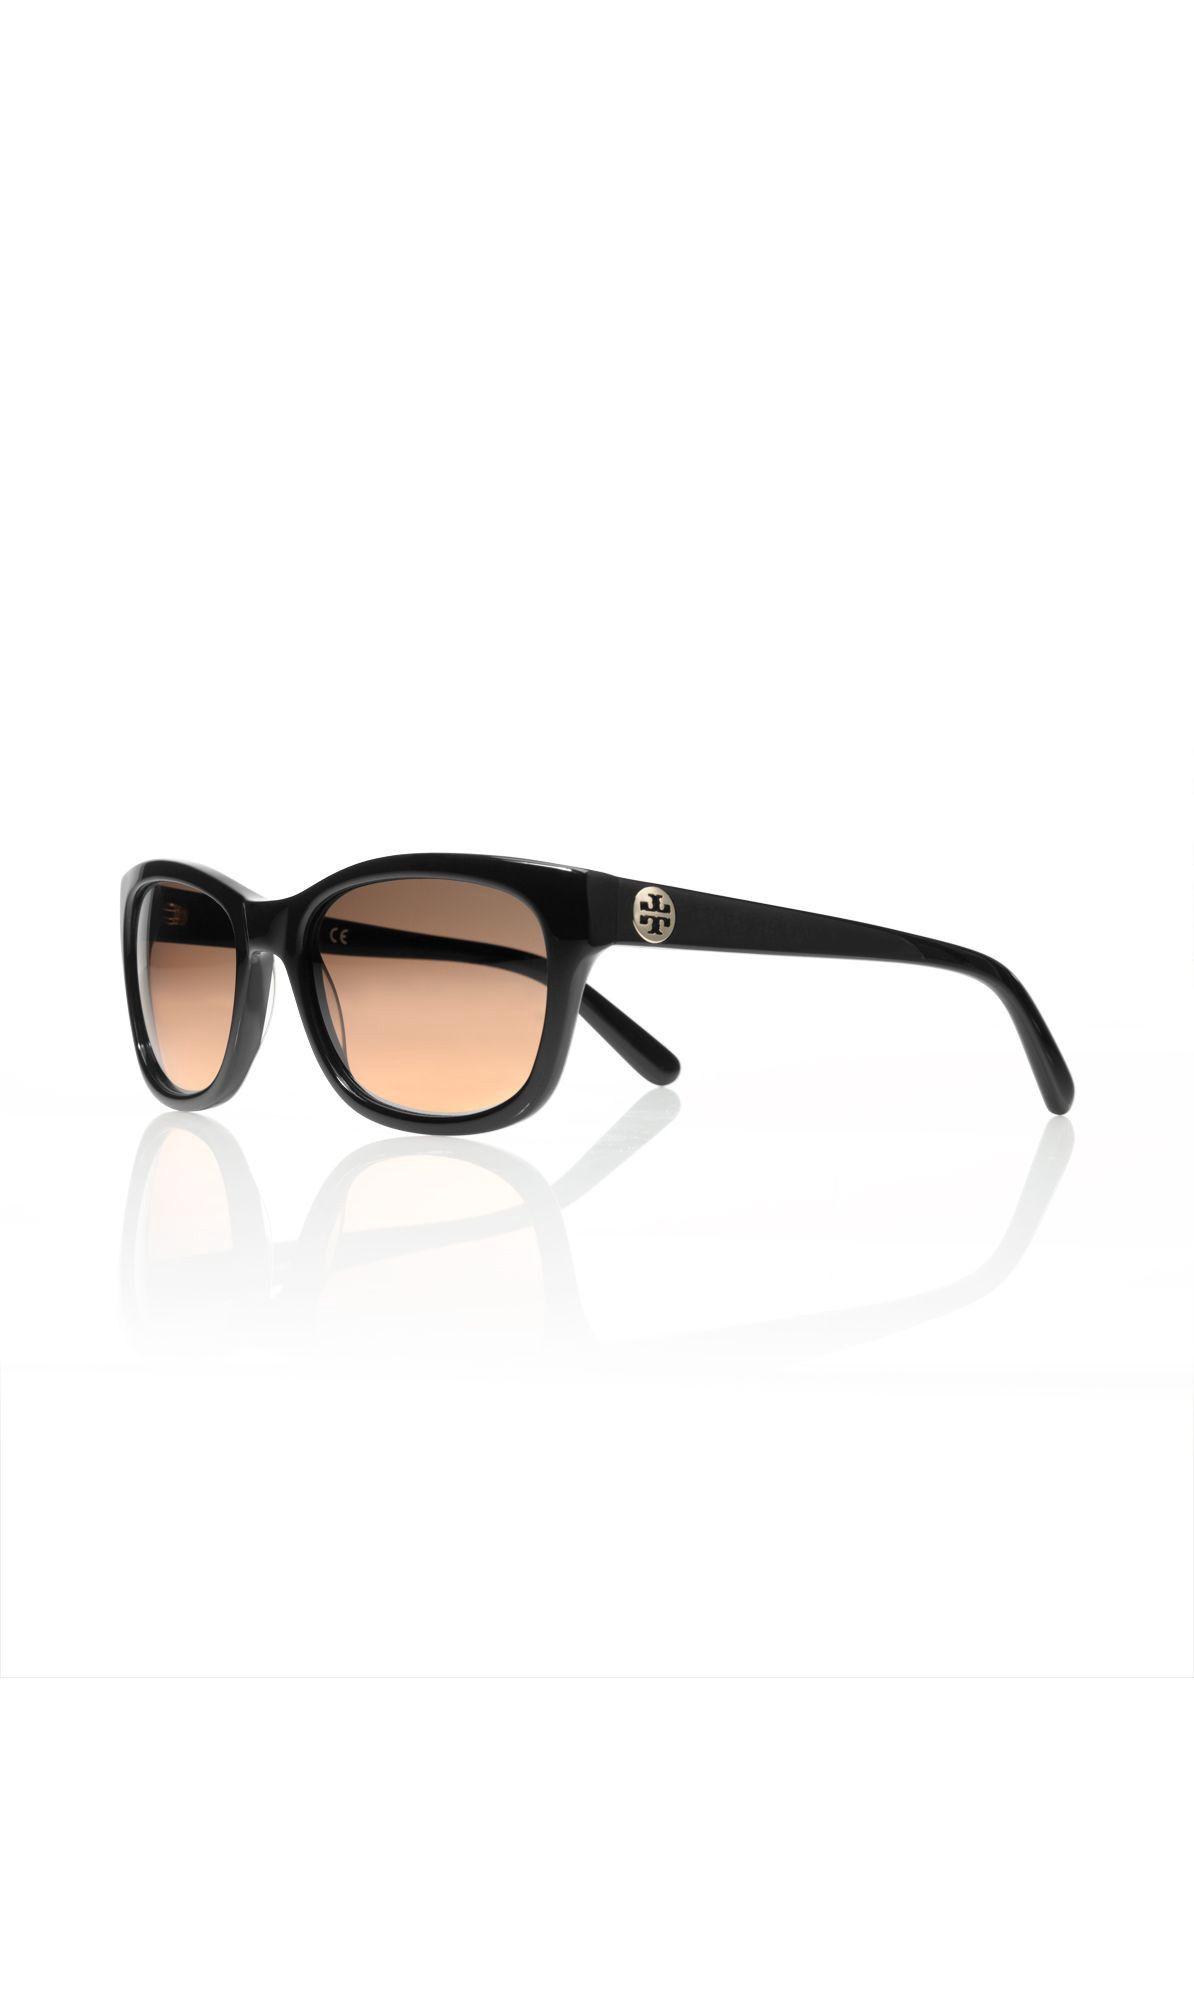 TORY BURCH Classic Sunglasses. #toryburch #all